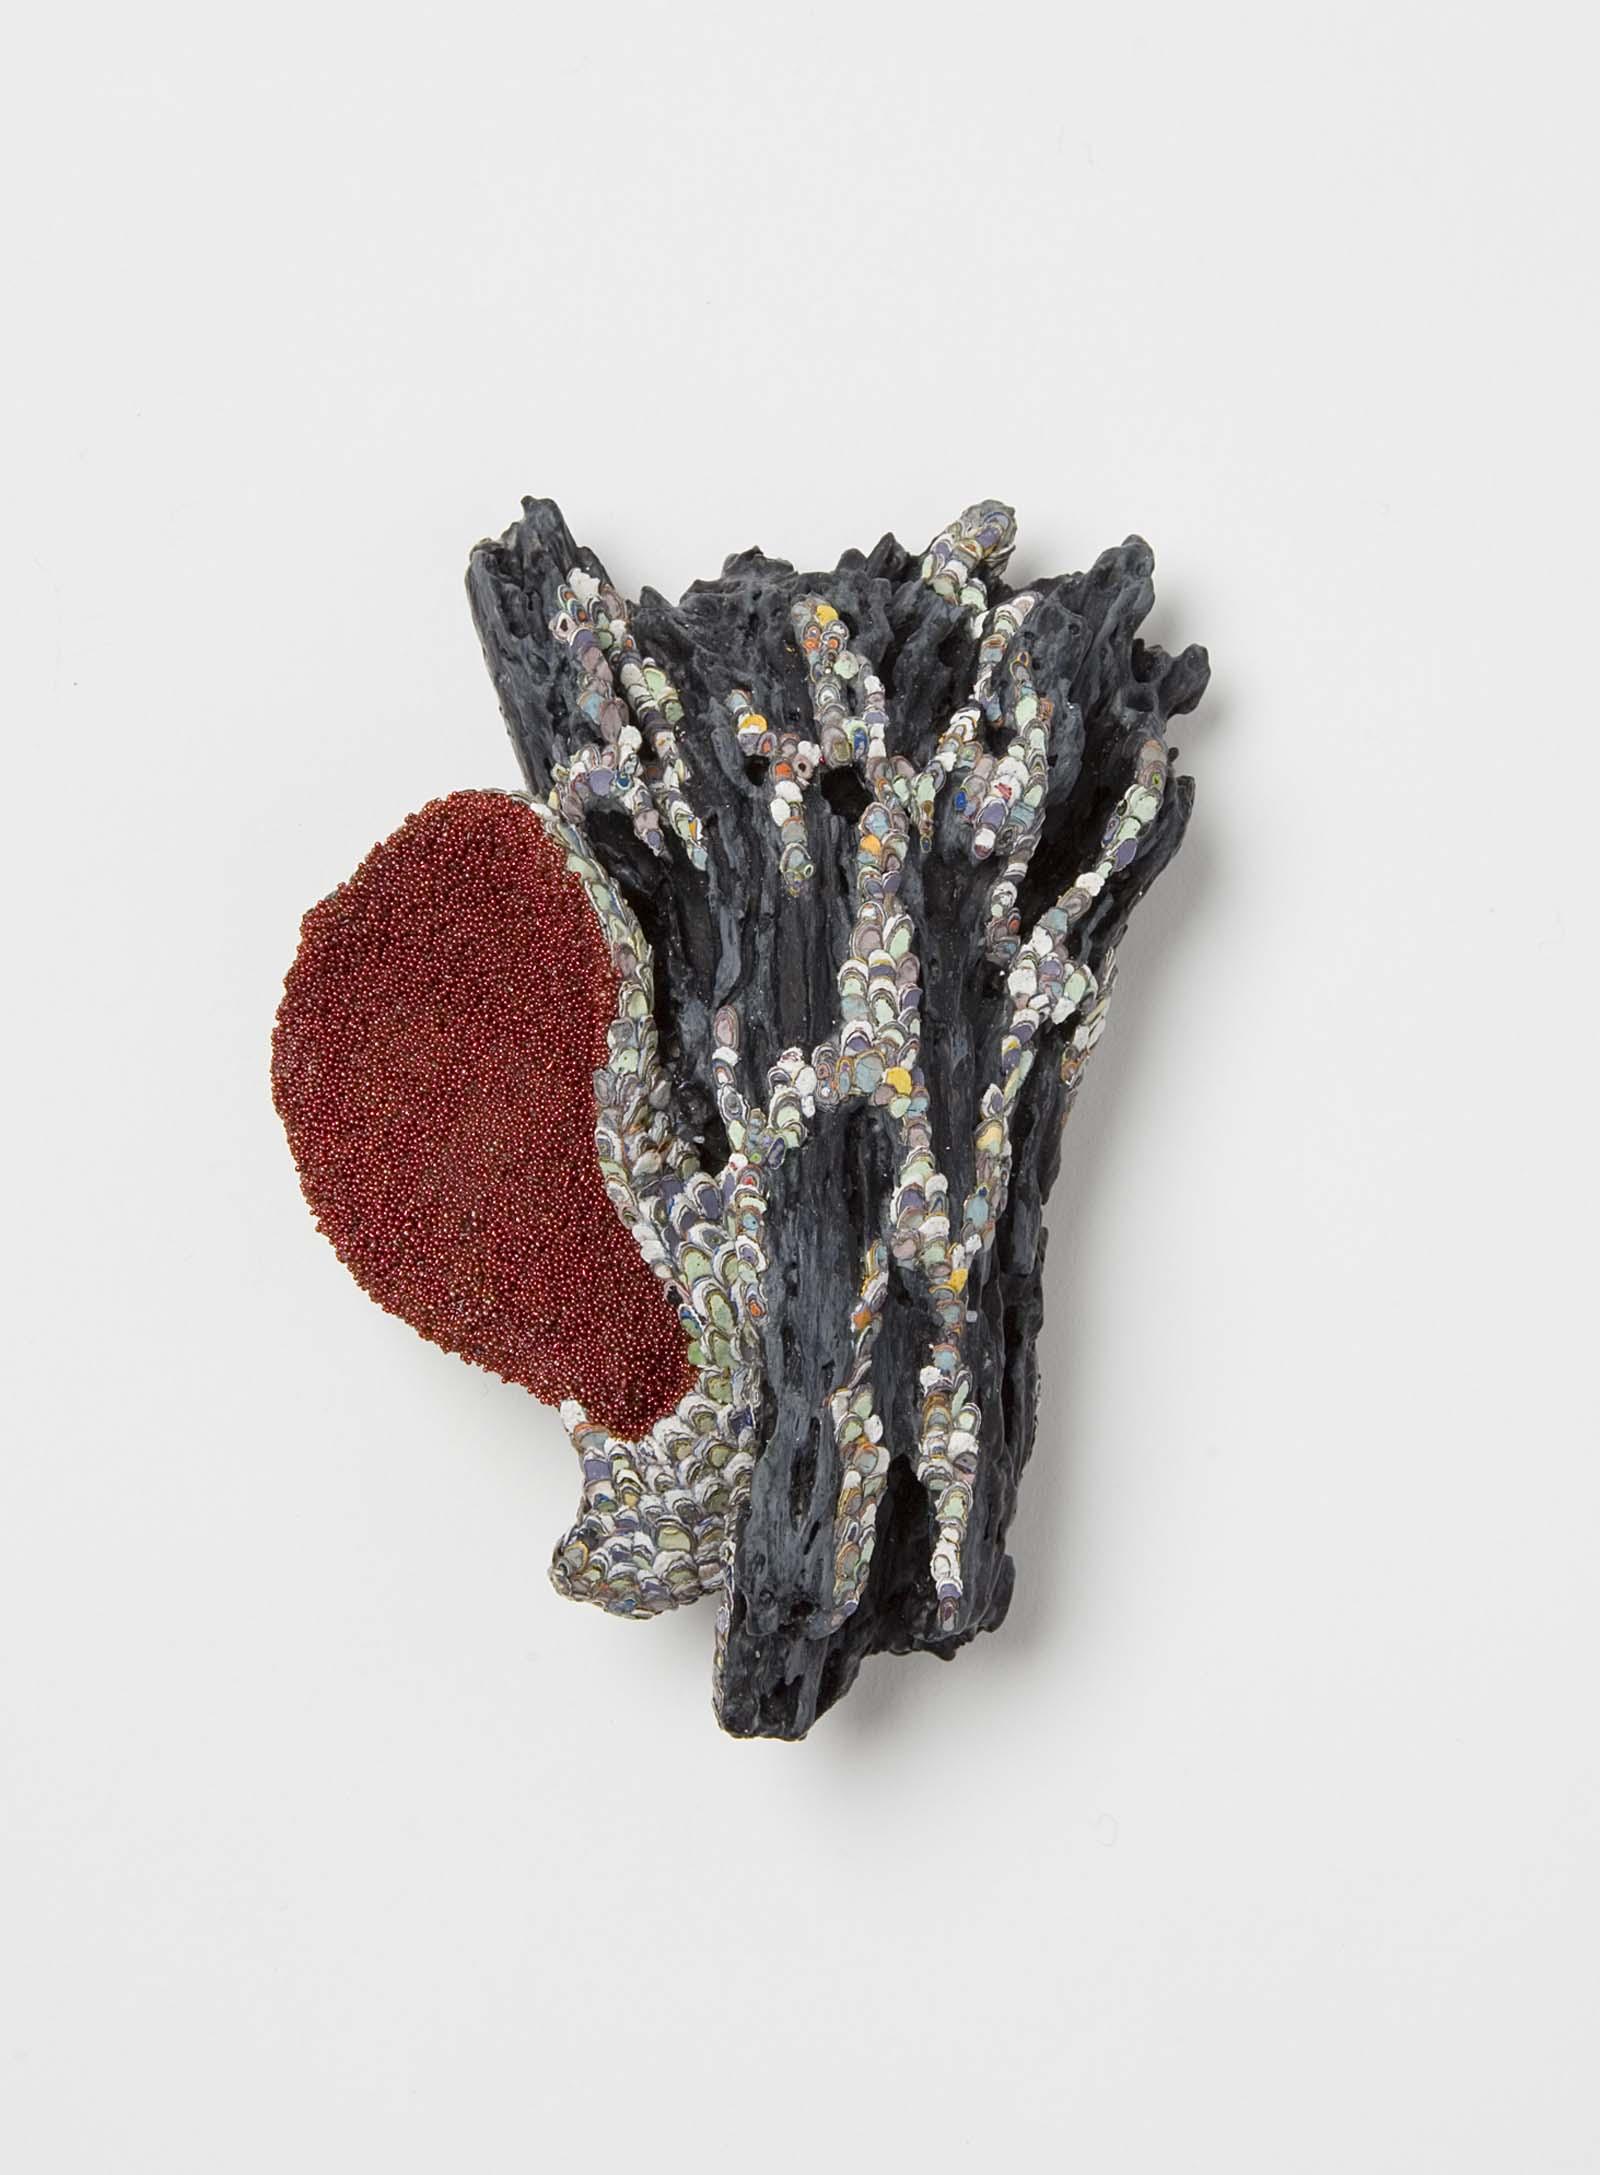 """Carnivore 2"" I Brooch, 2015 I Wood, graffiti, oyster shell, glass, silver, stainless steel, paint I Photo: Mirei Takeuchi"